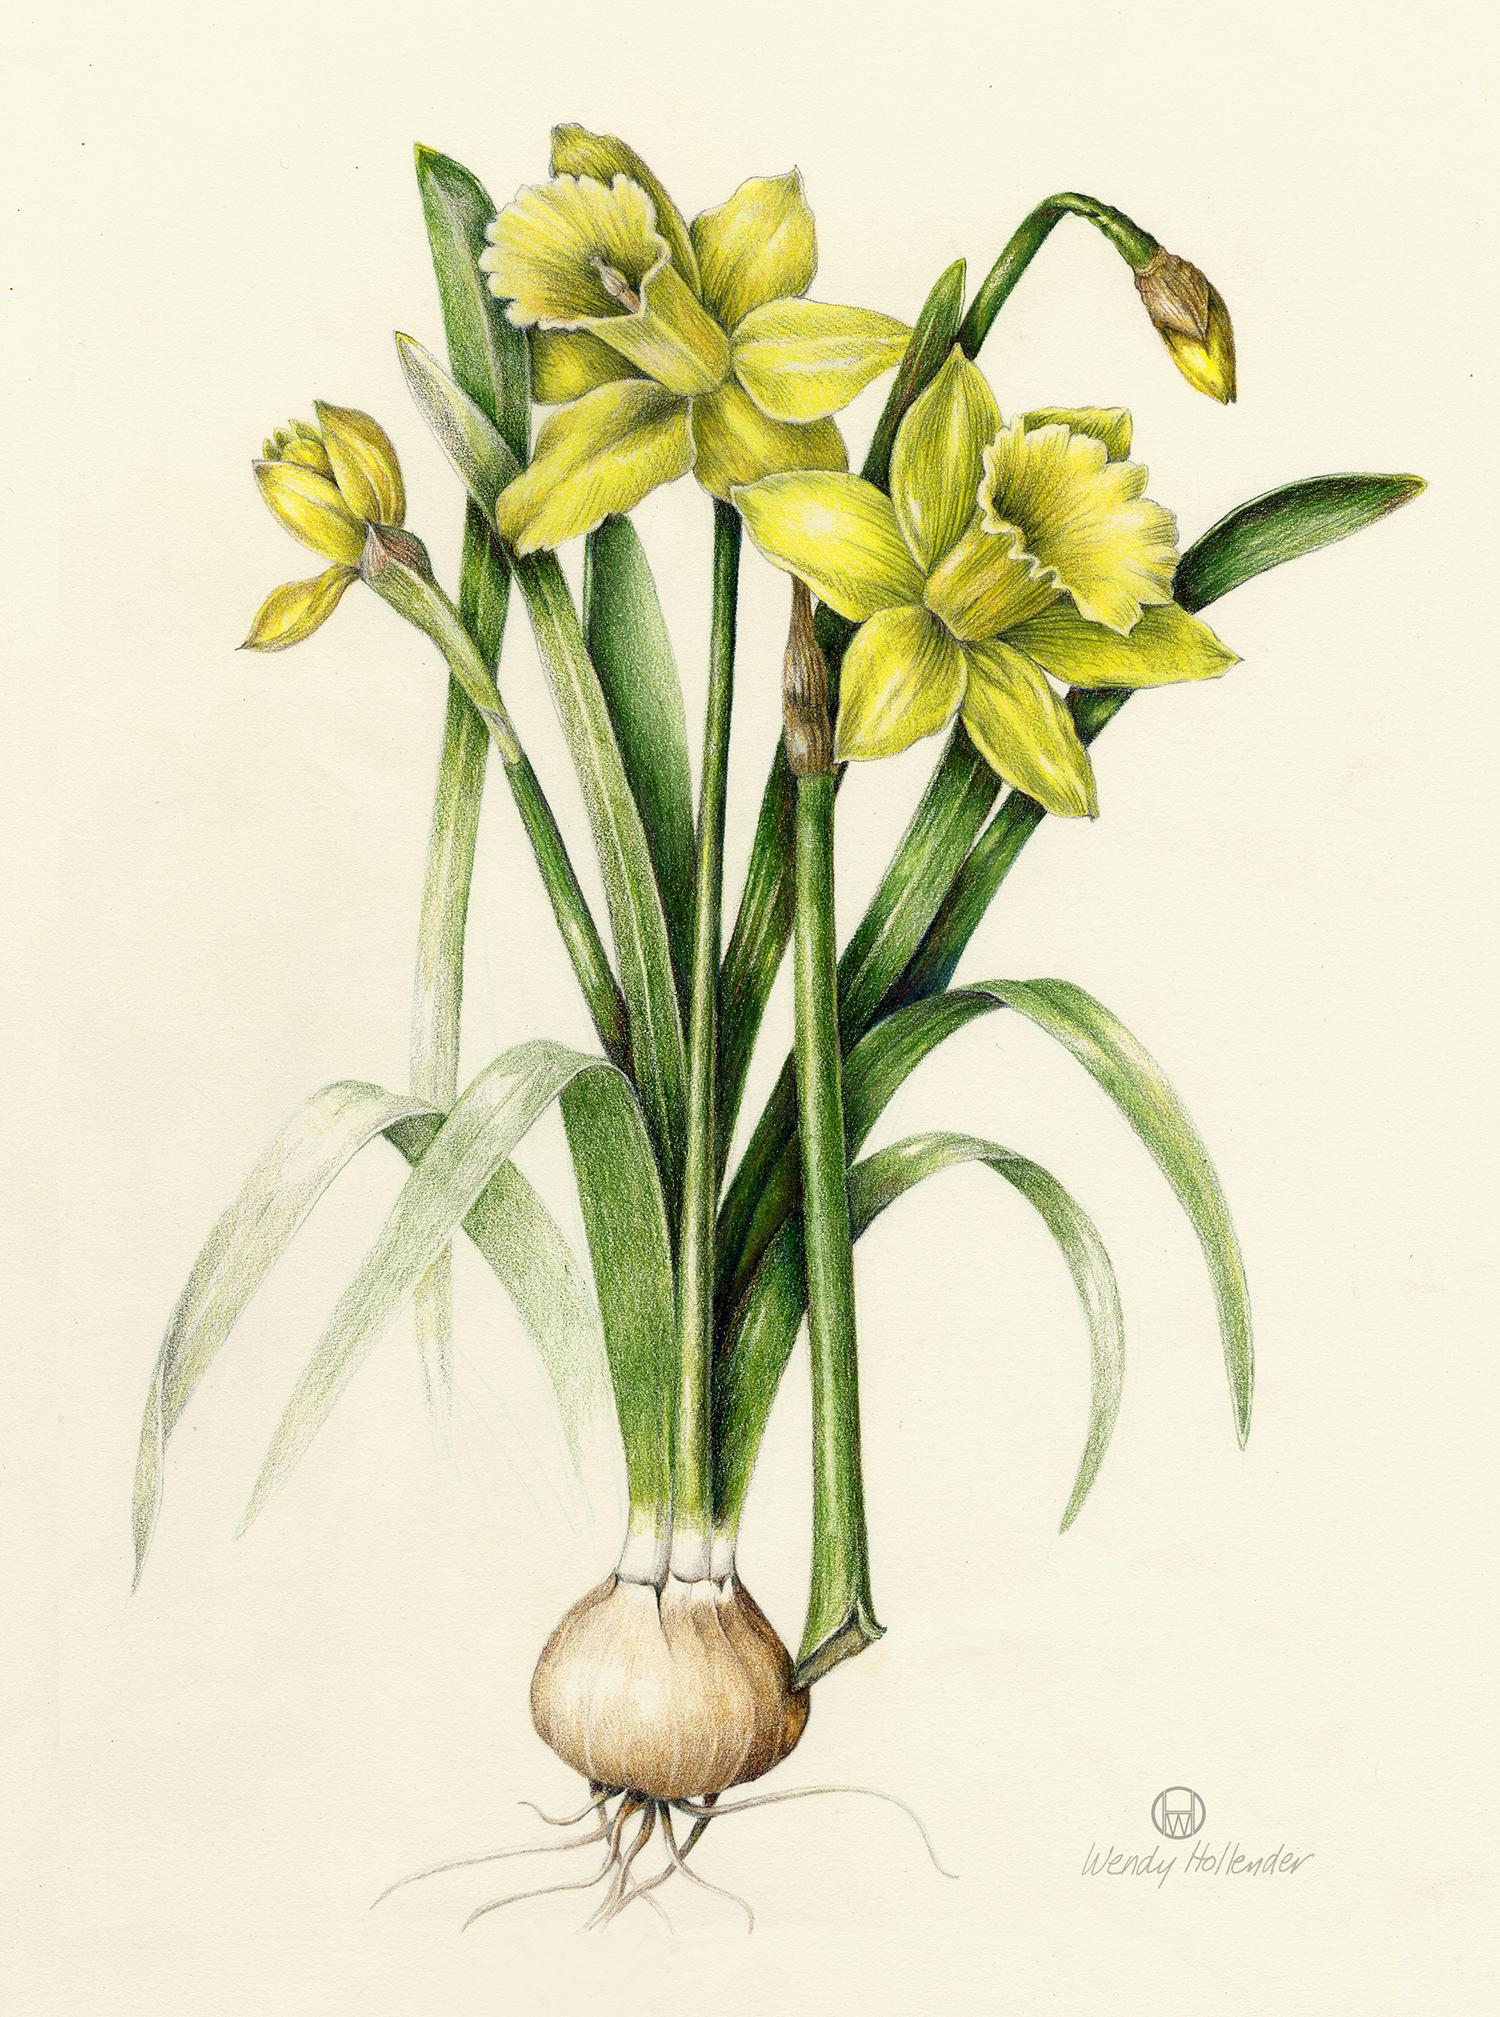 Daffodil - Narcissus